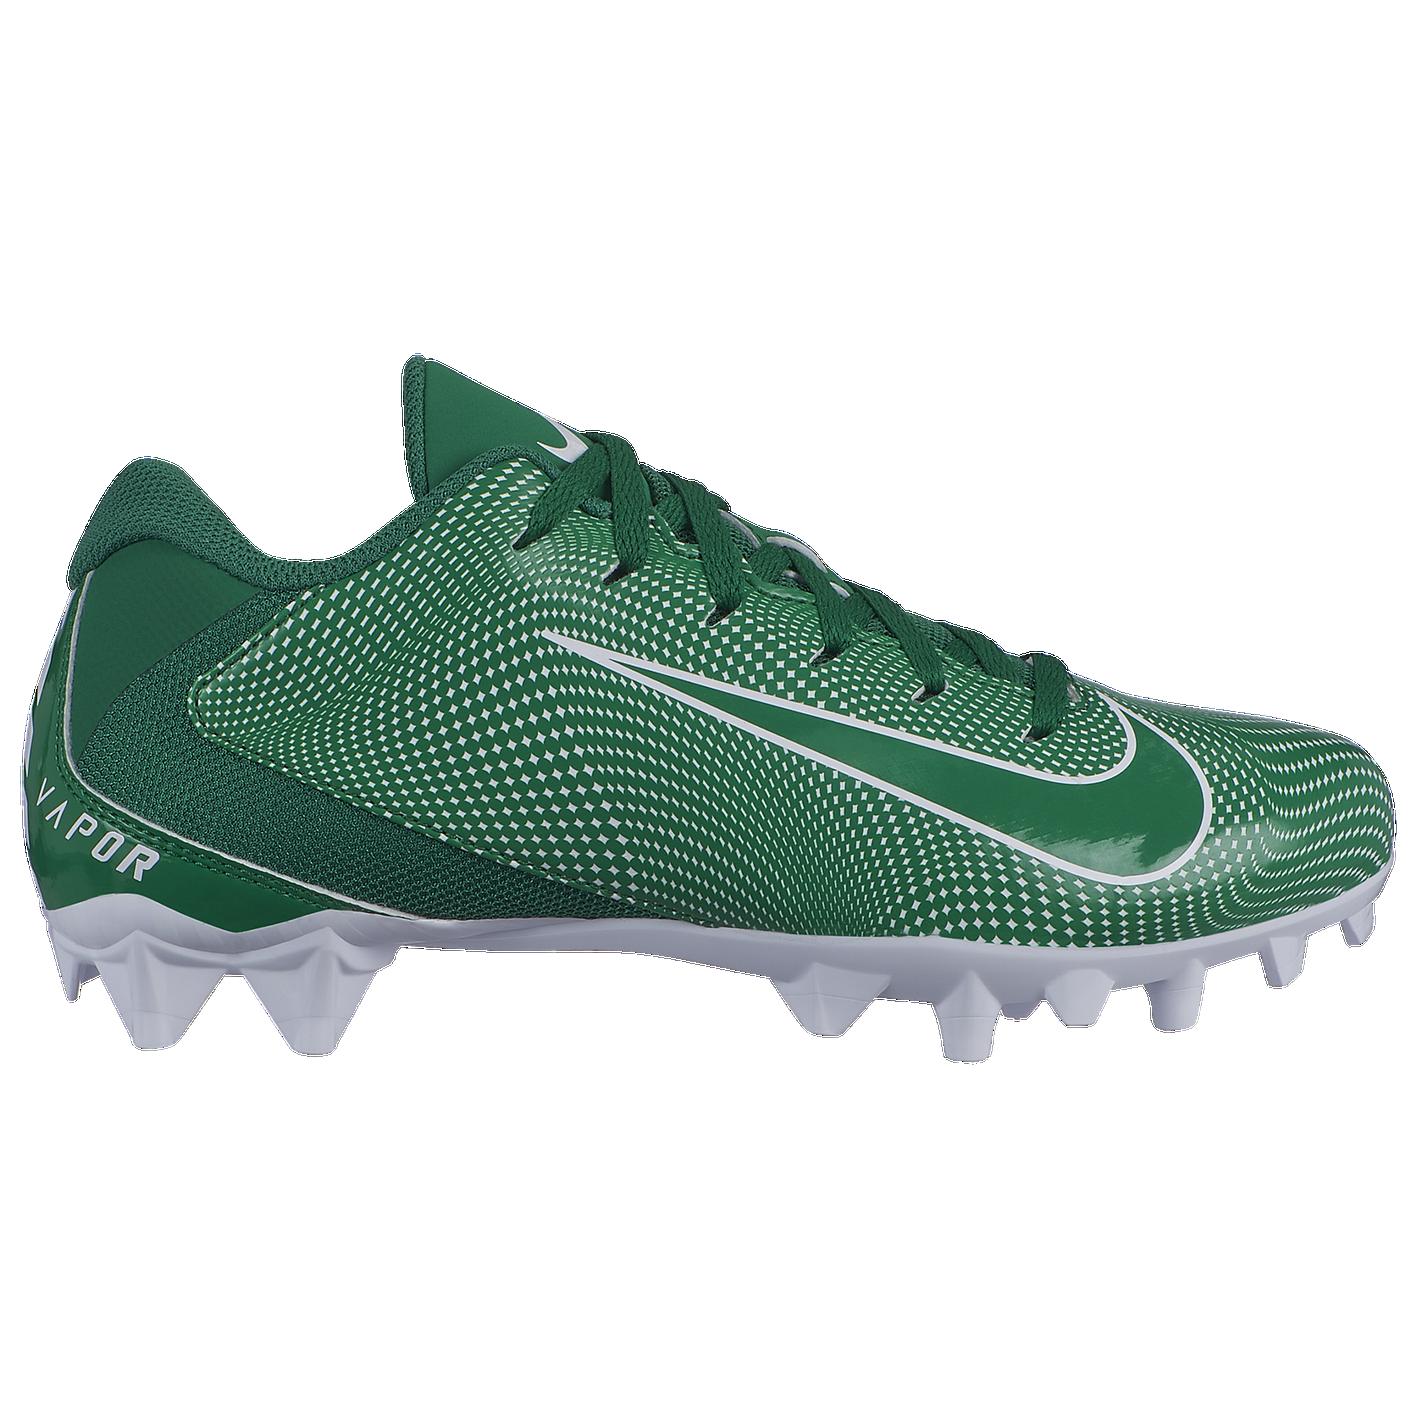 50a1f6903 Nike Vapor Untouchable Varsity 3 BG - Boys' Grade School - Football ...